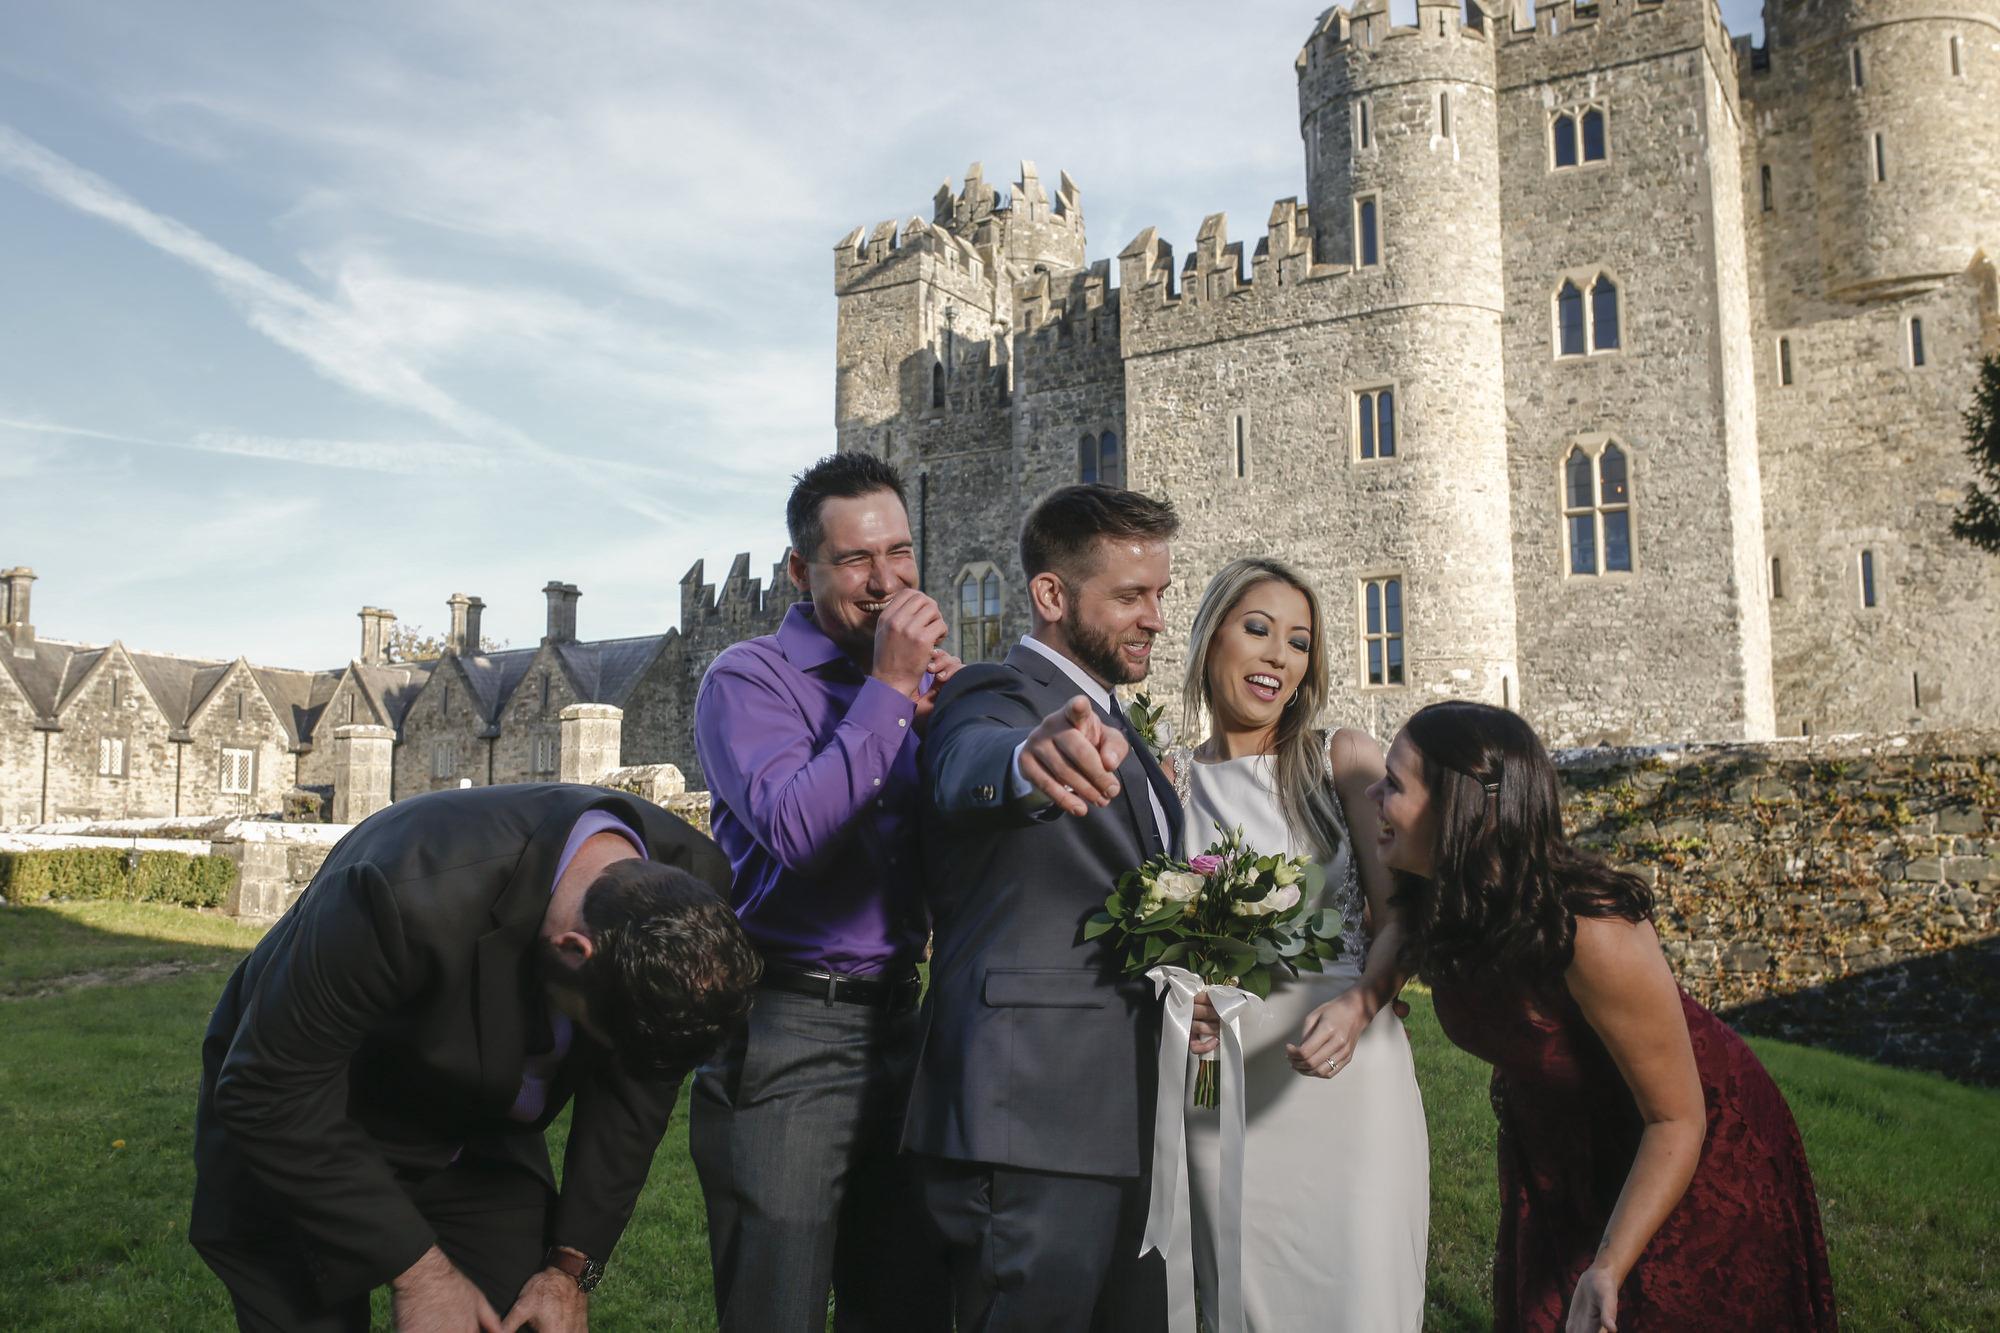 kilkea_castle_wedding_photographer_goldenmoments_038.jpg